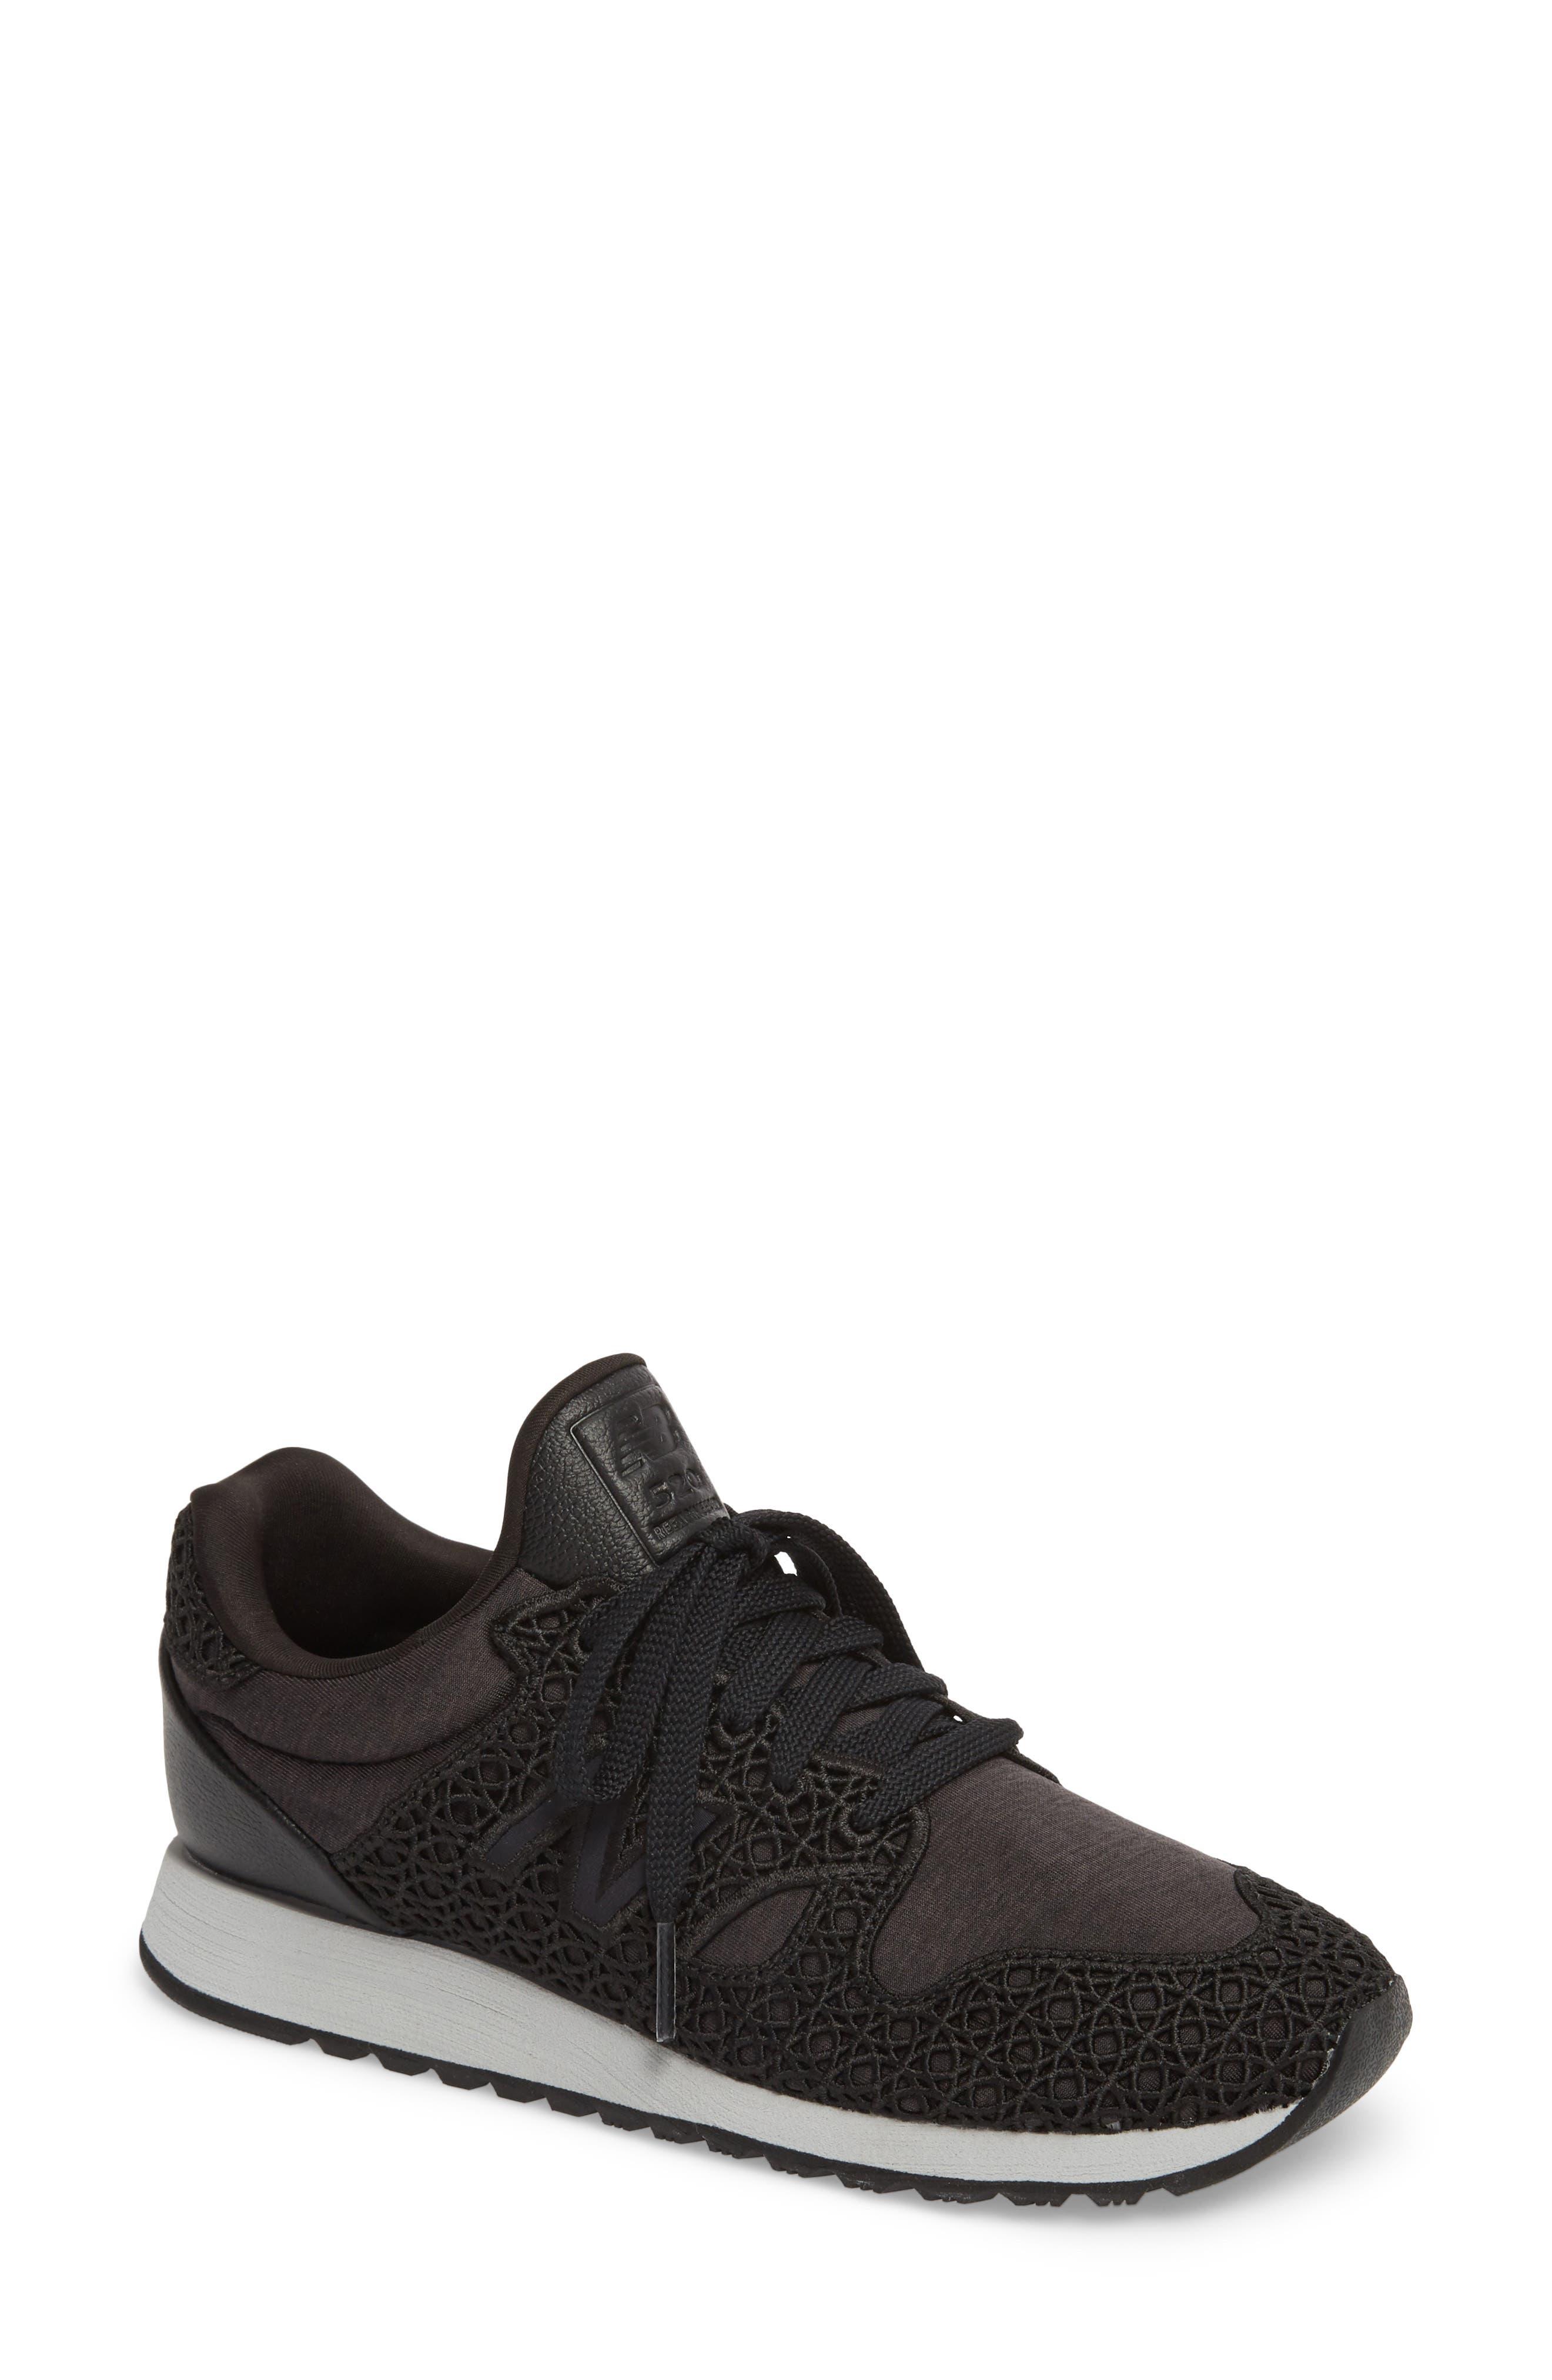 520 Sneaker,                             Main thumbnail 1, color,                             ONYX